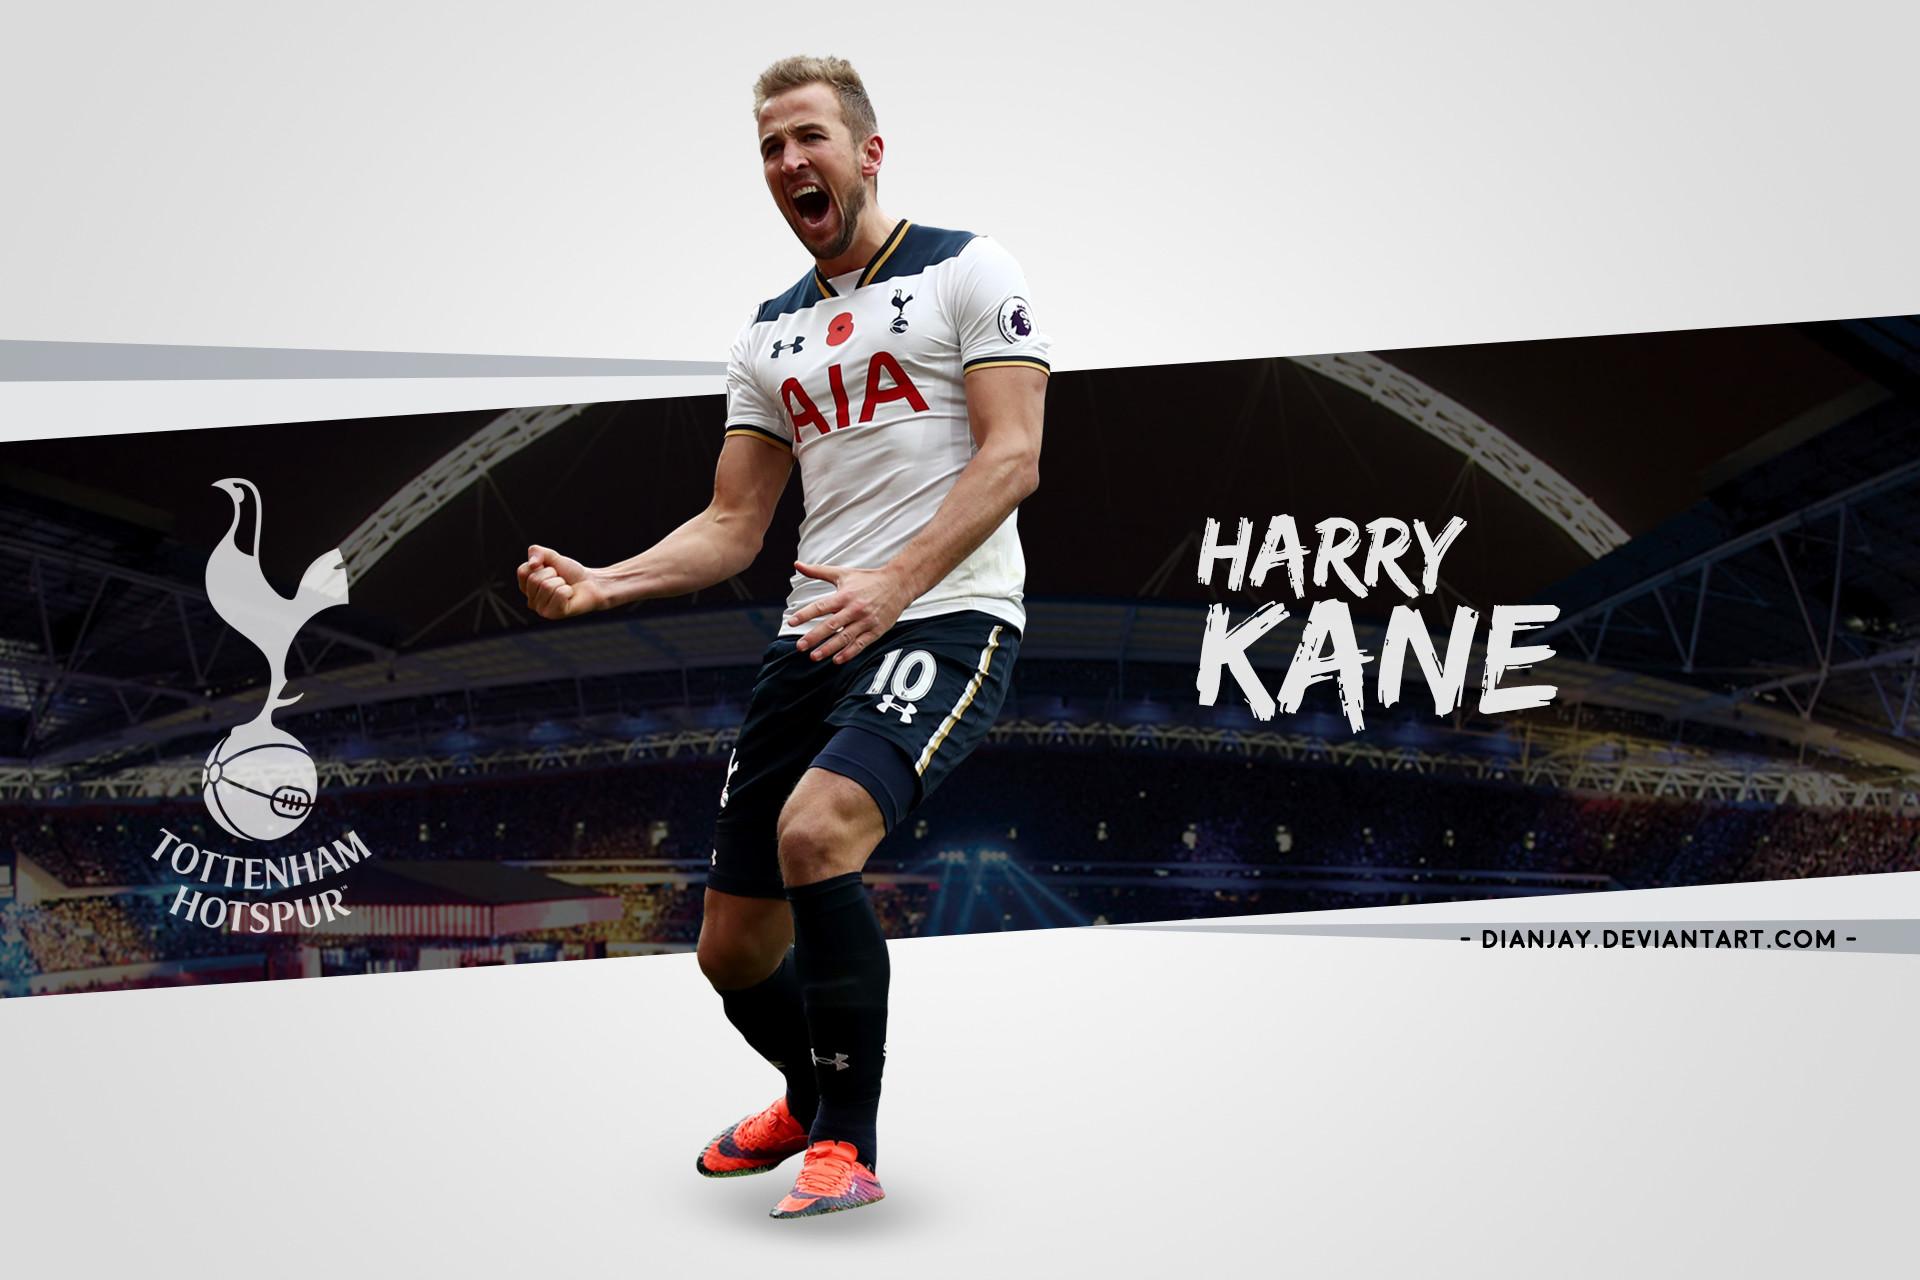 Kane Wallpaper (71+ Pictures